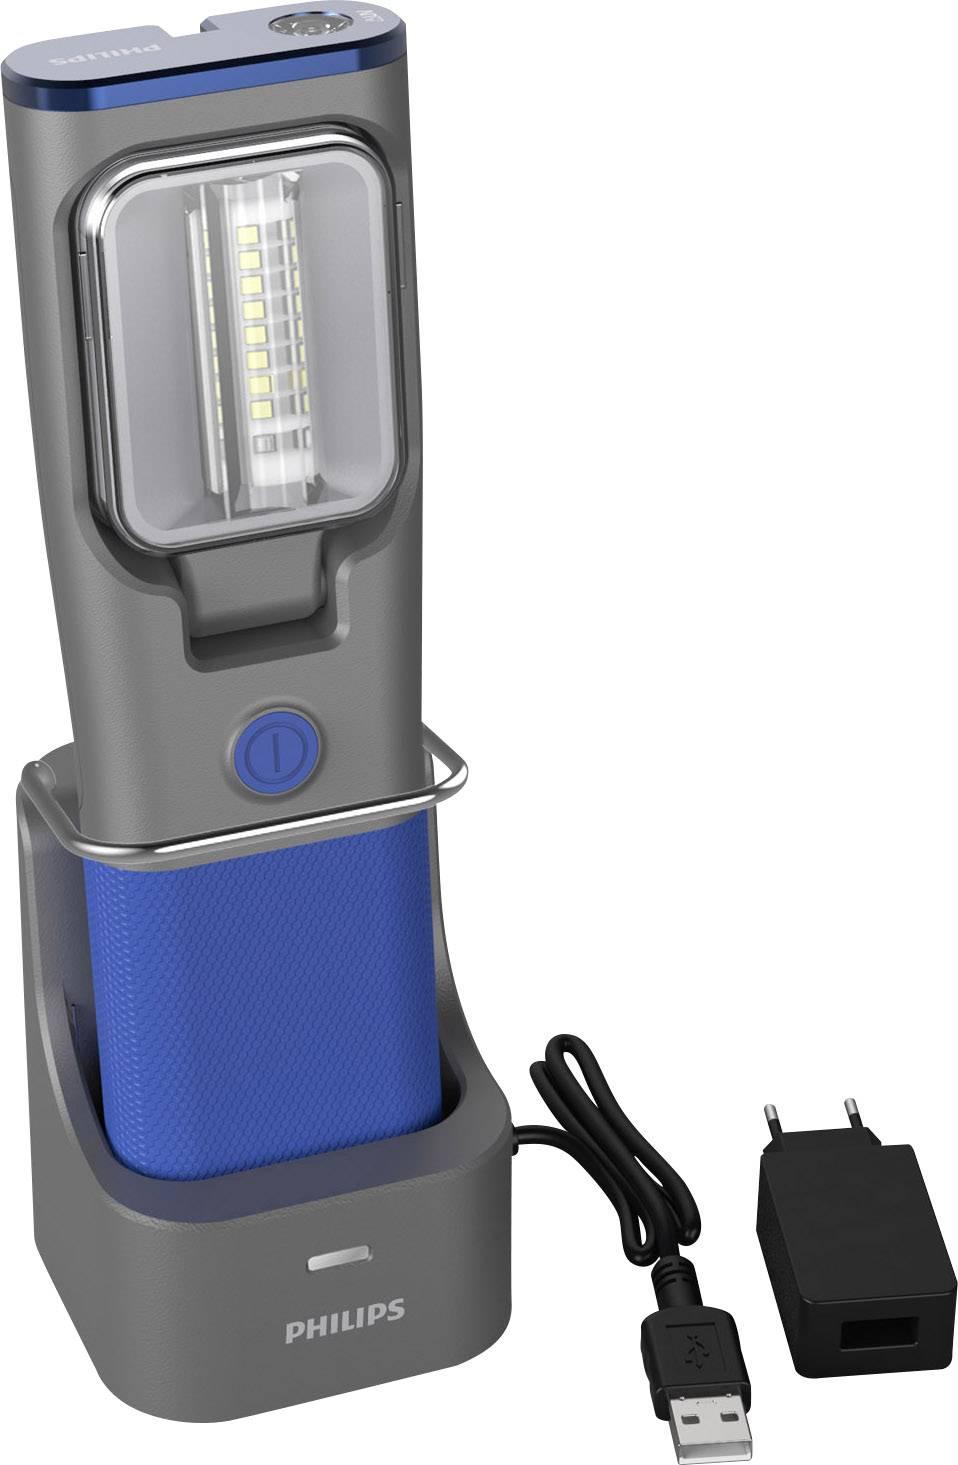 Strålande SMD-LED Arbetslampa Uppladdningsbara batteri Philips LPL34UVX1 WD-56